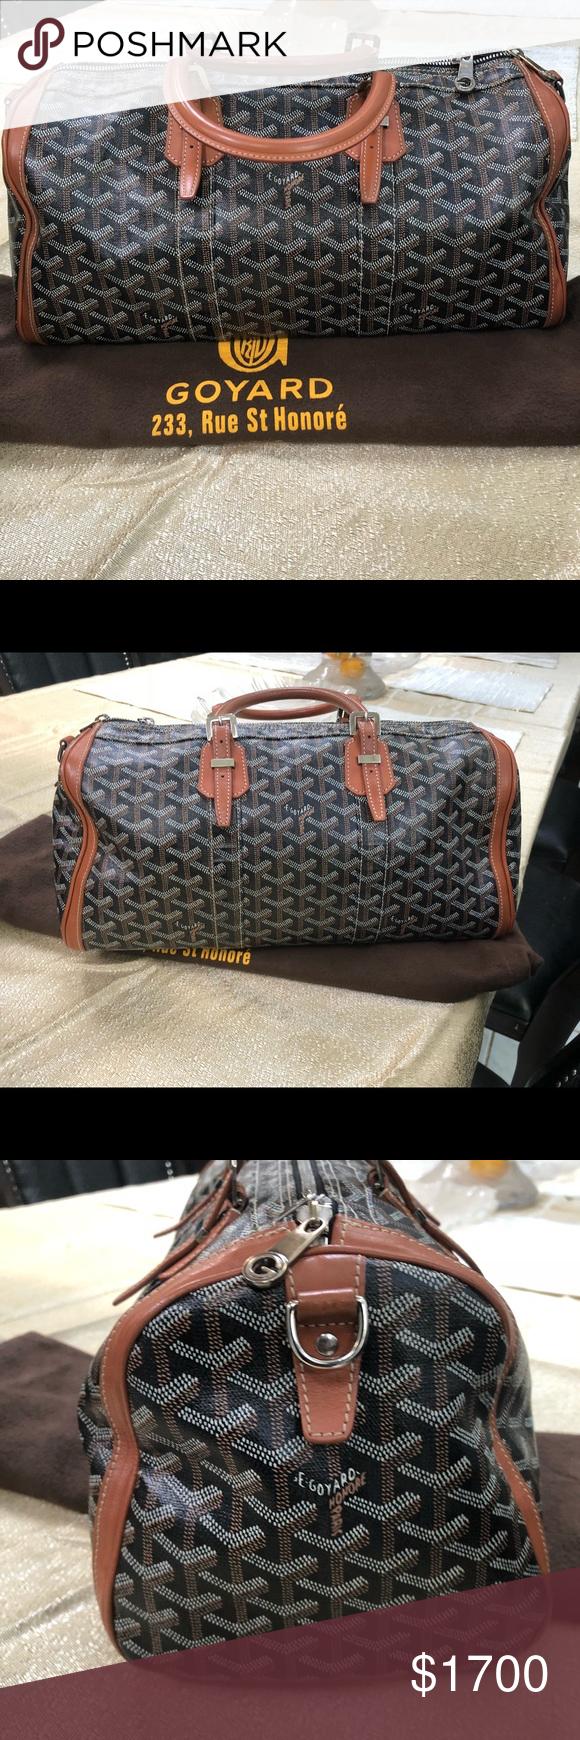 Goyard Goyardine Croisiere 40 Duffle Bag Preowned care. I ship next day.  This will 86b0108dd6